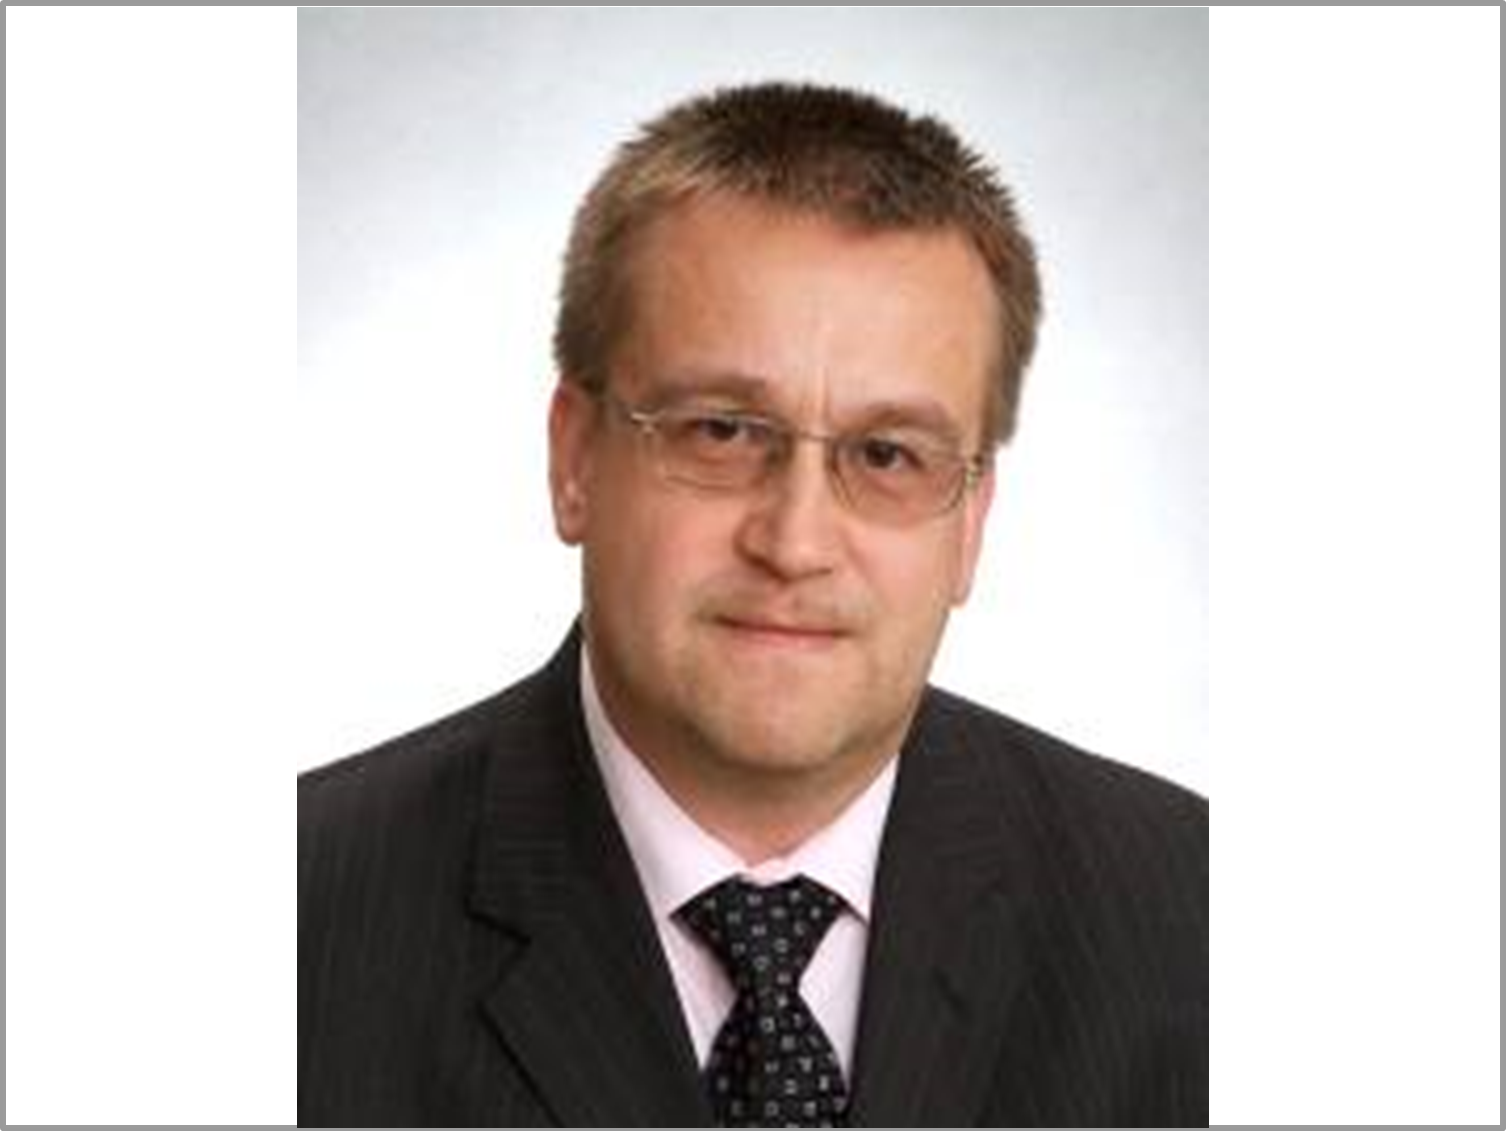 Jaroslaw Korytowski